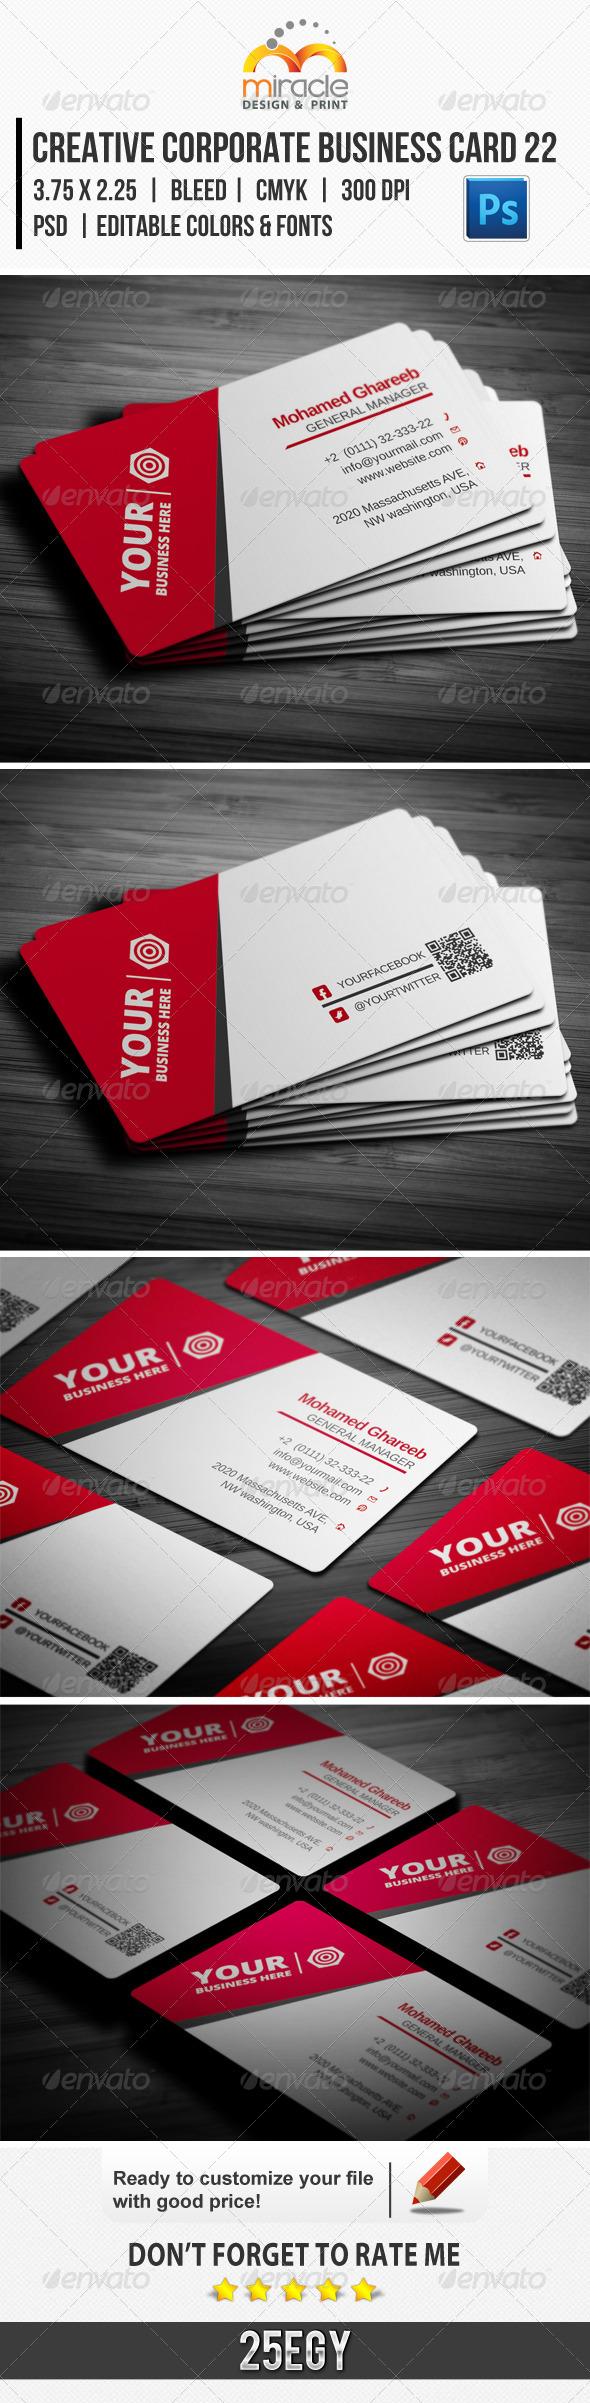 Creative Corporate Business Card 22 - Corporate Business Cards